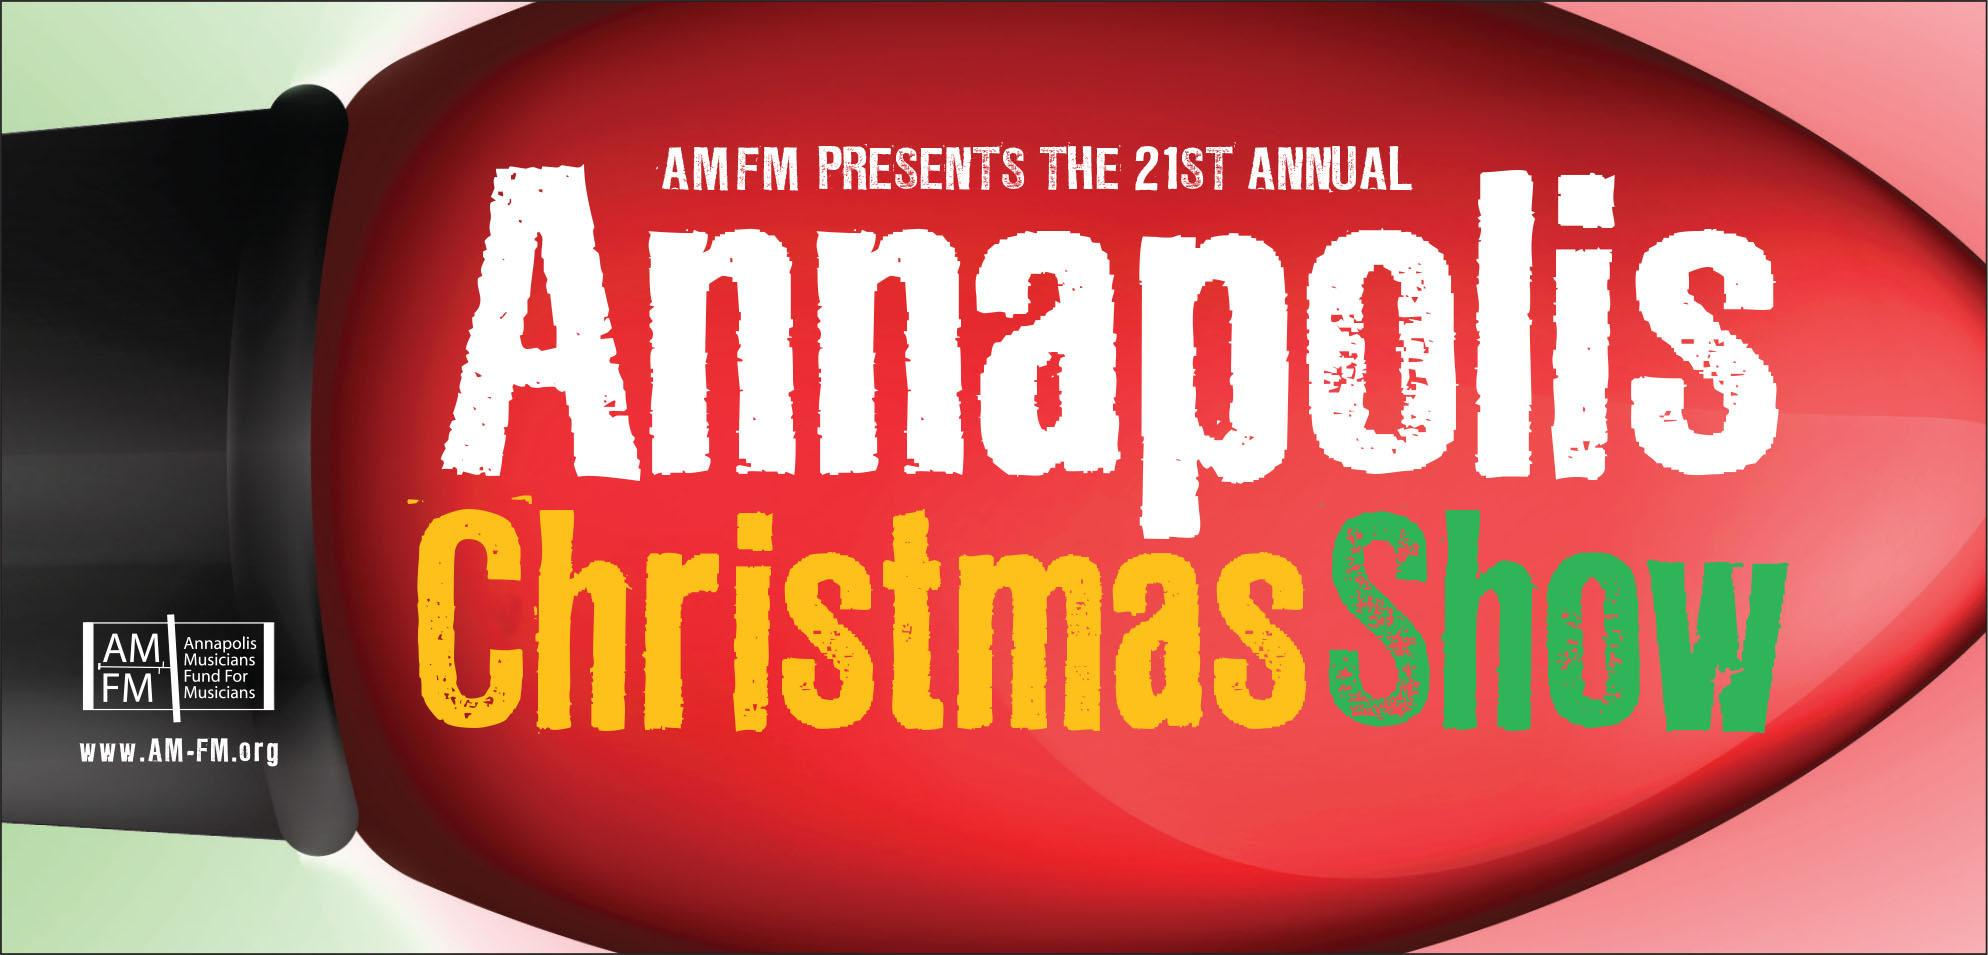 AMFM Presents An Annapolis Christmas